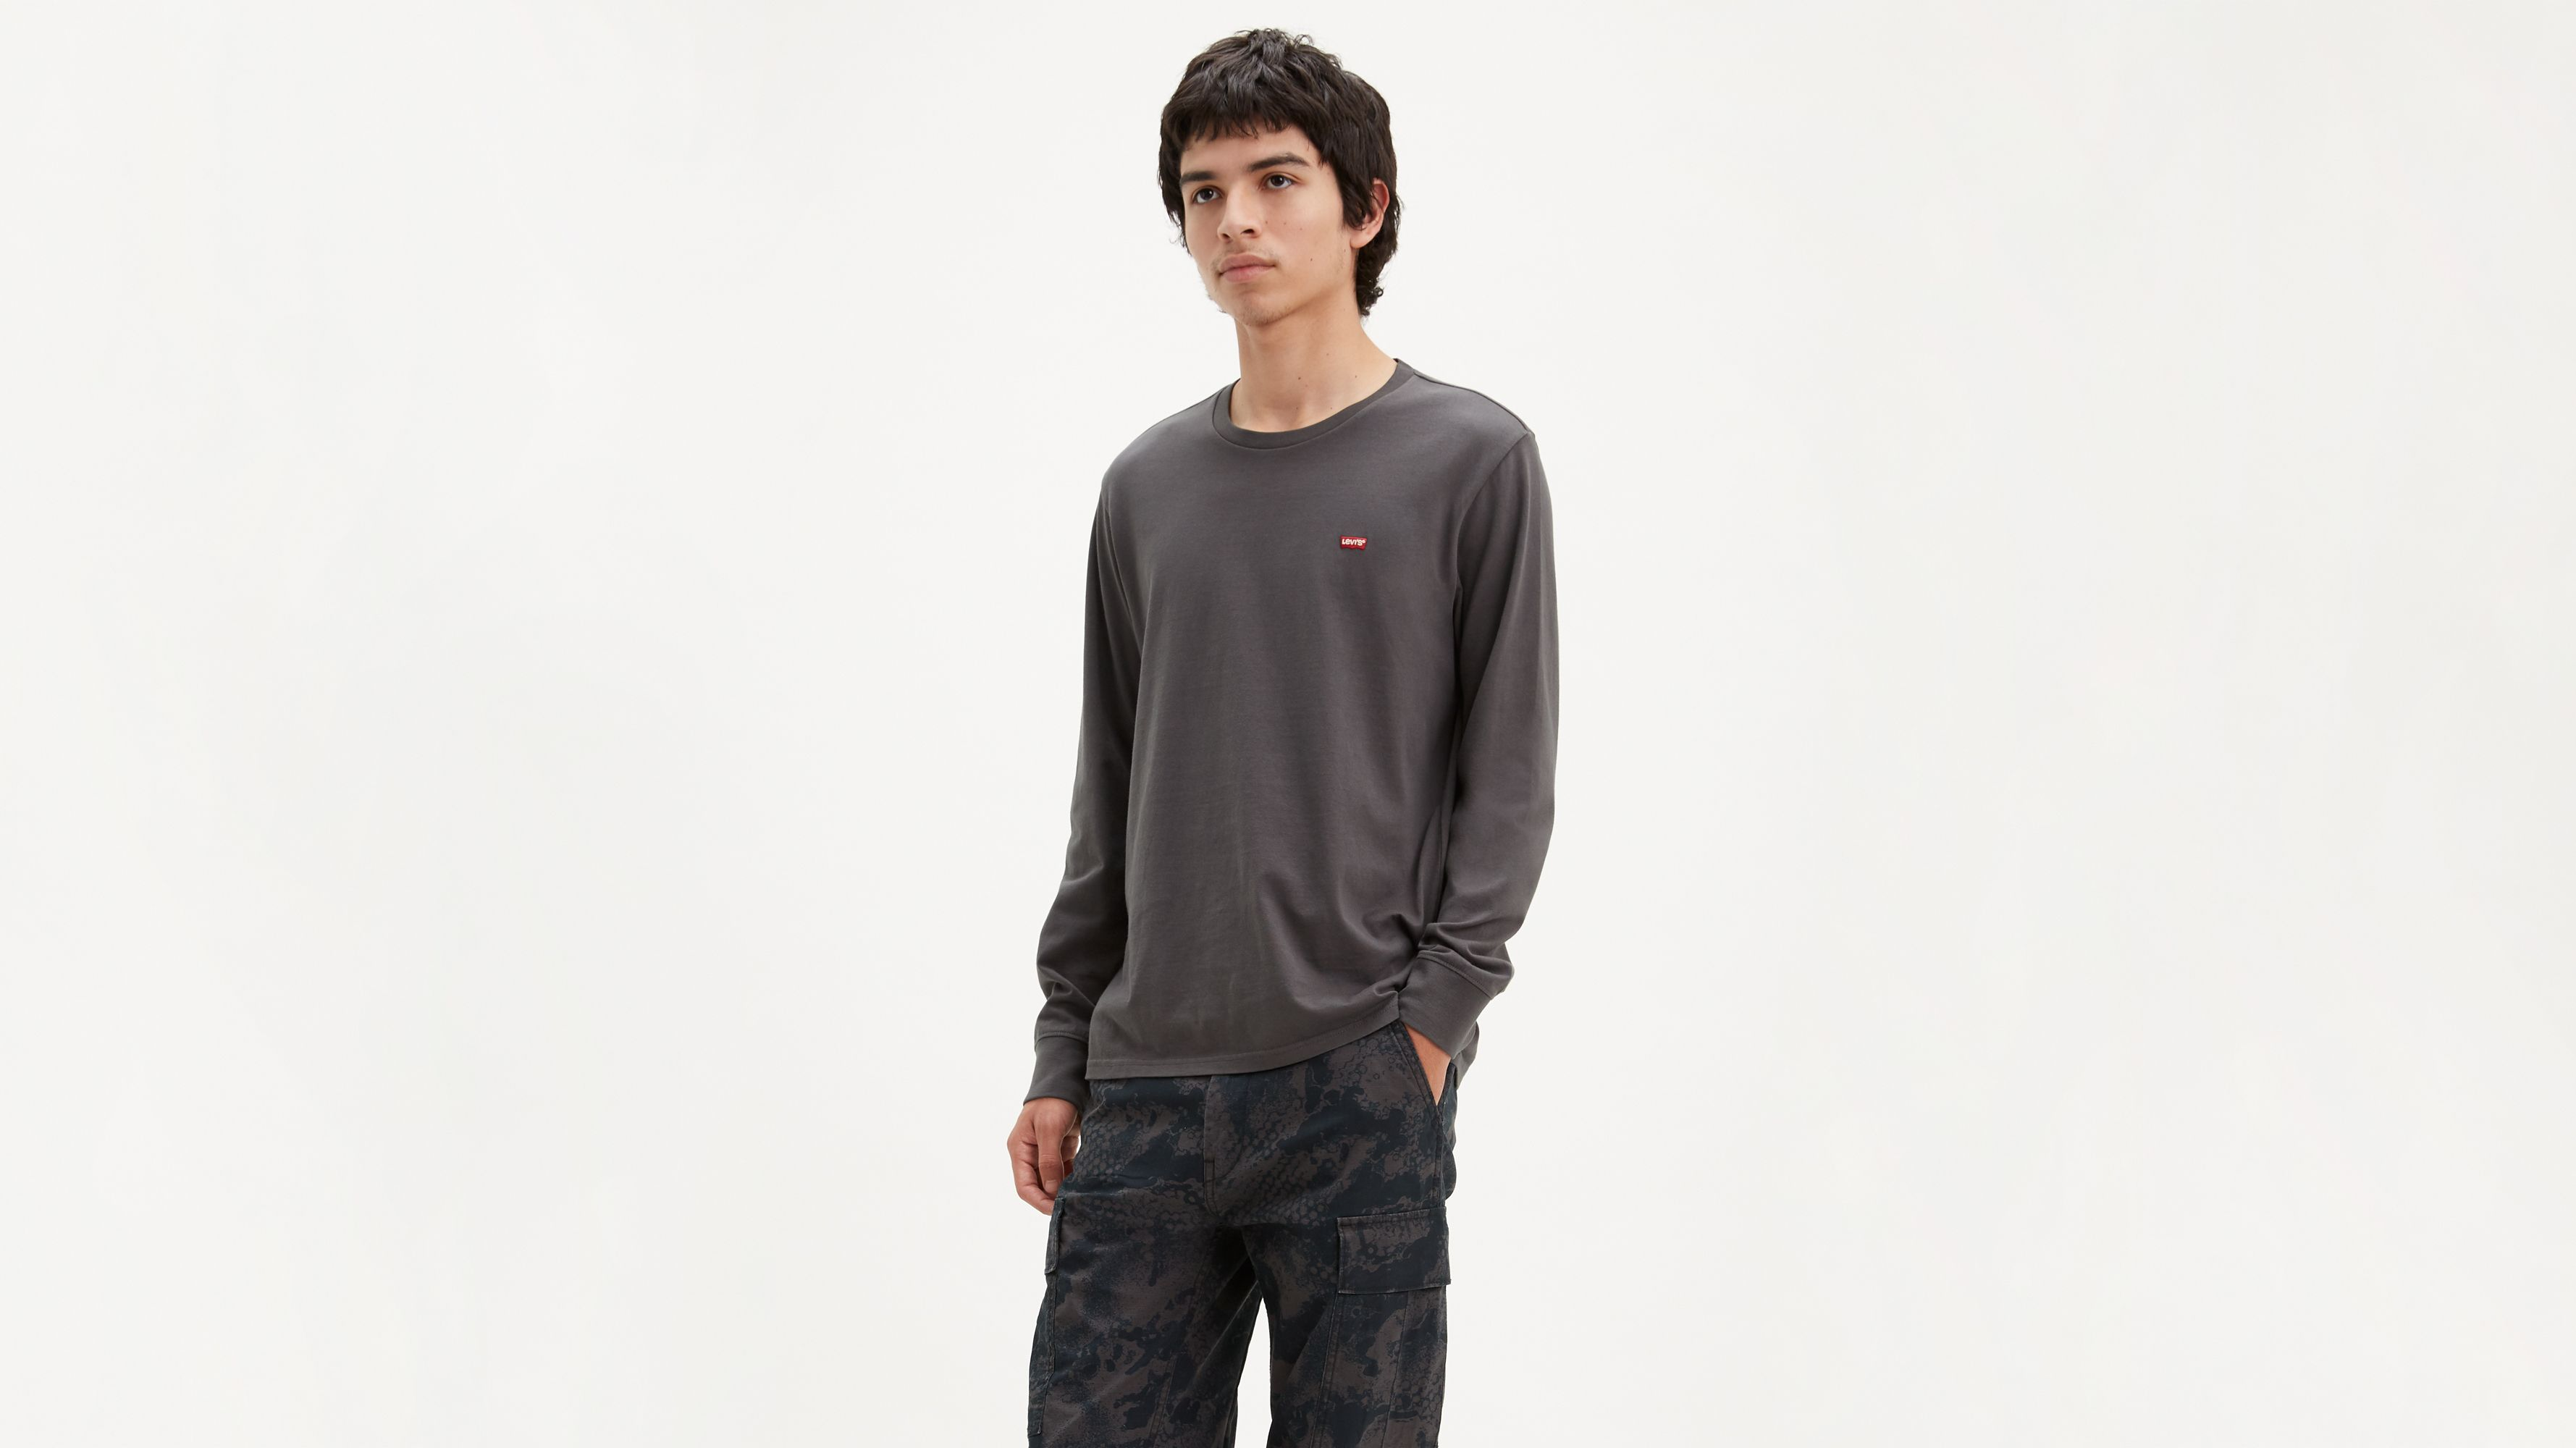 Original Long Sleeve Tee Shirt